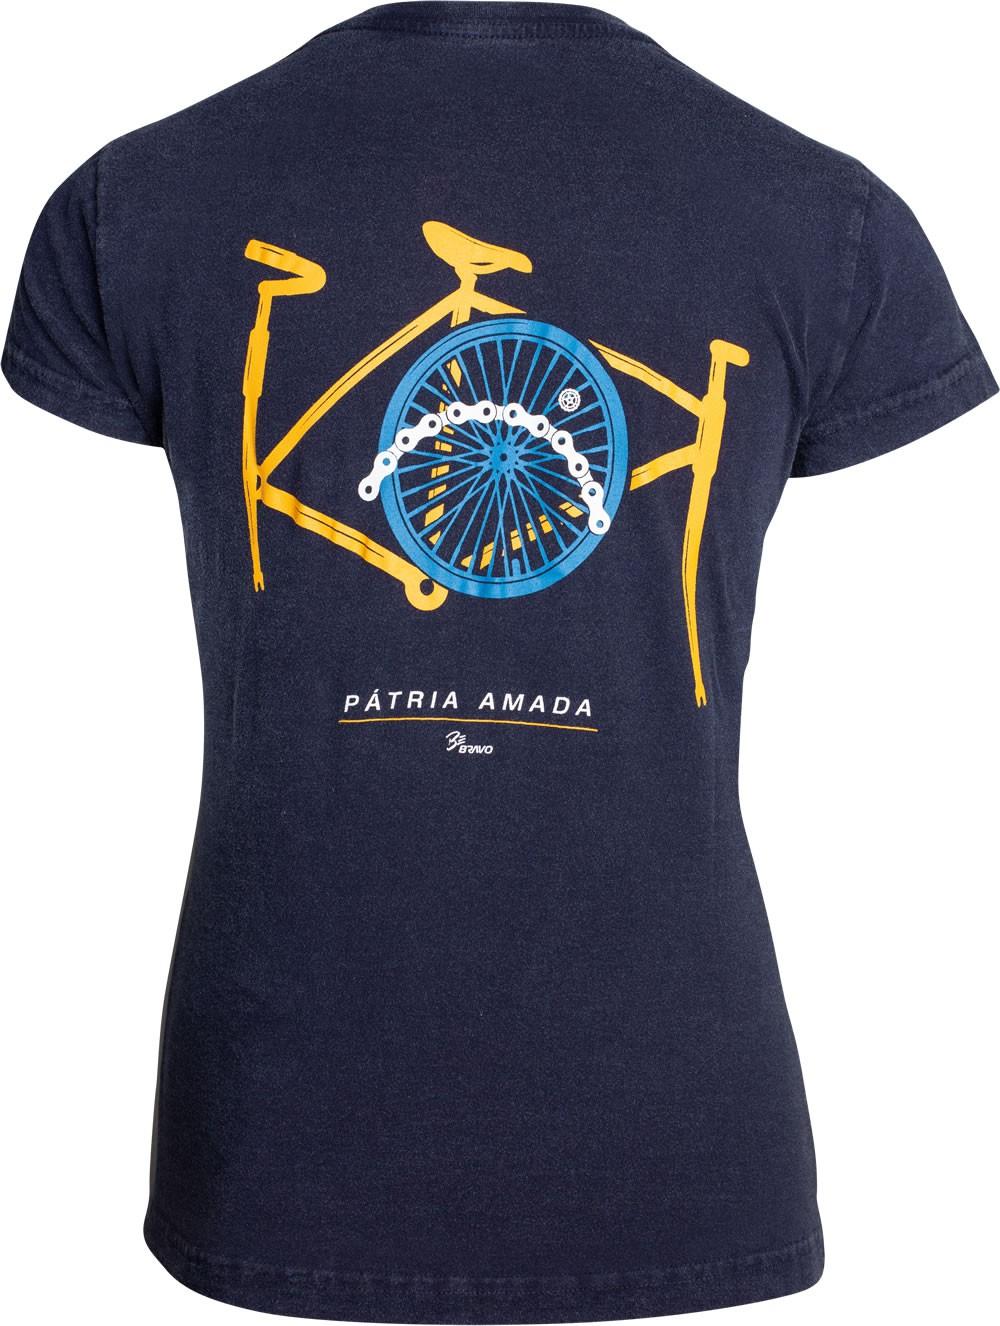 Camiseta Be Bravo Pátria Amada Feminina Azul